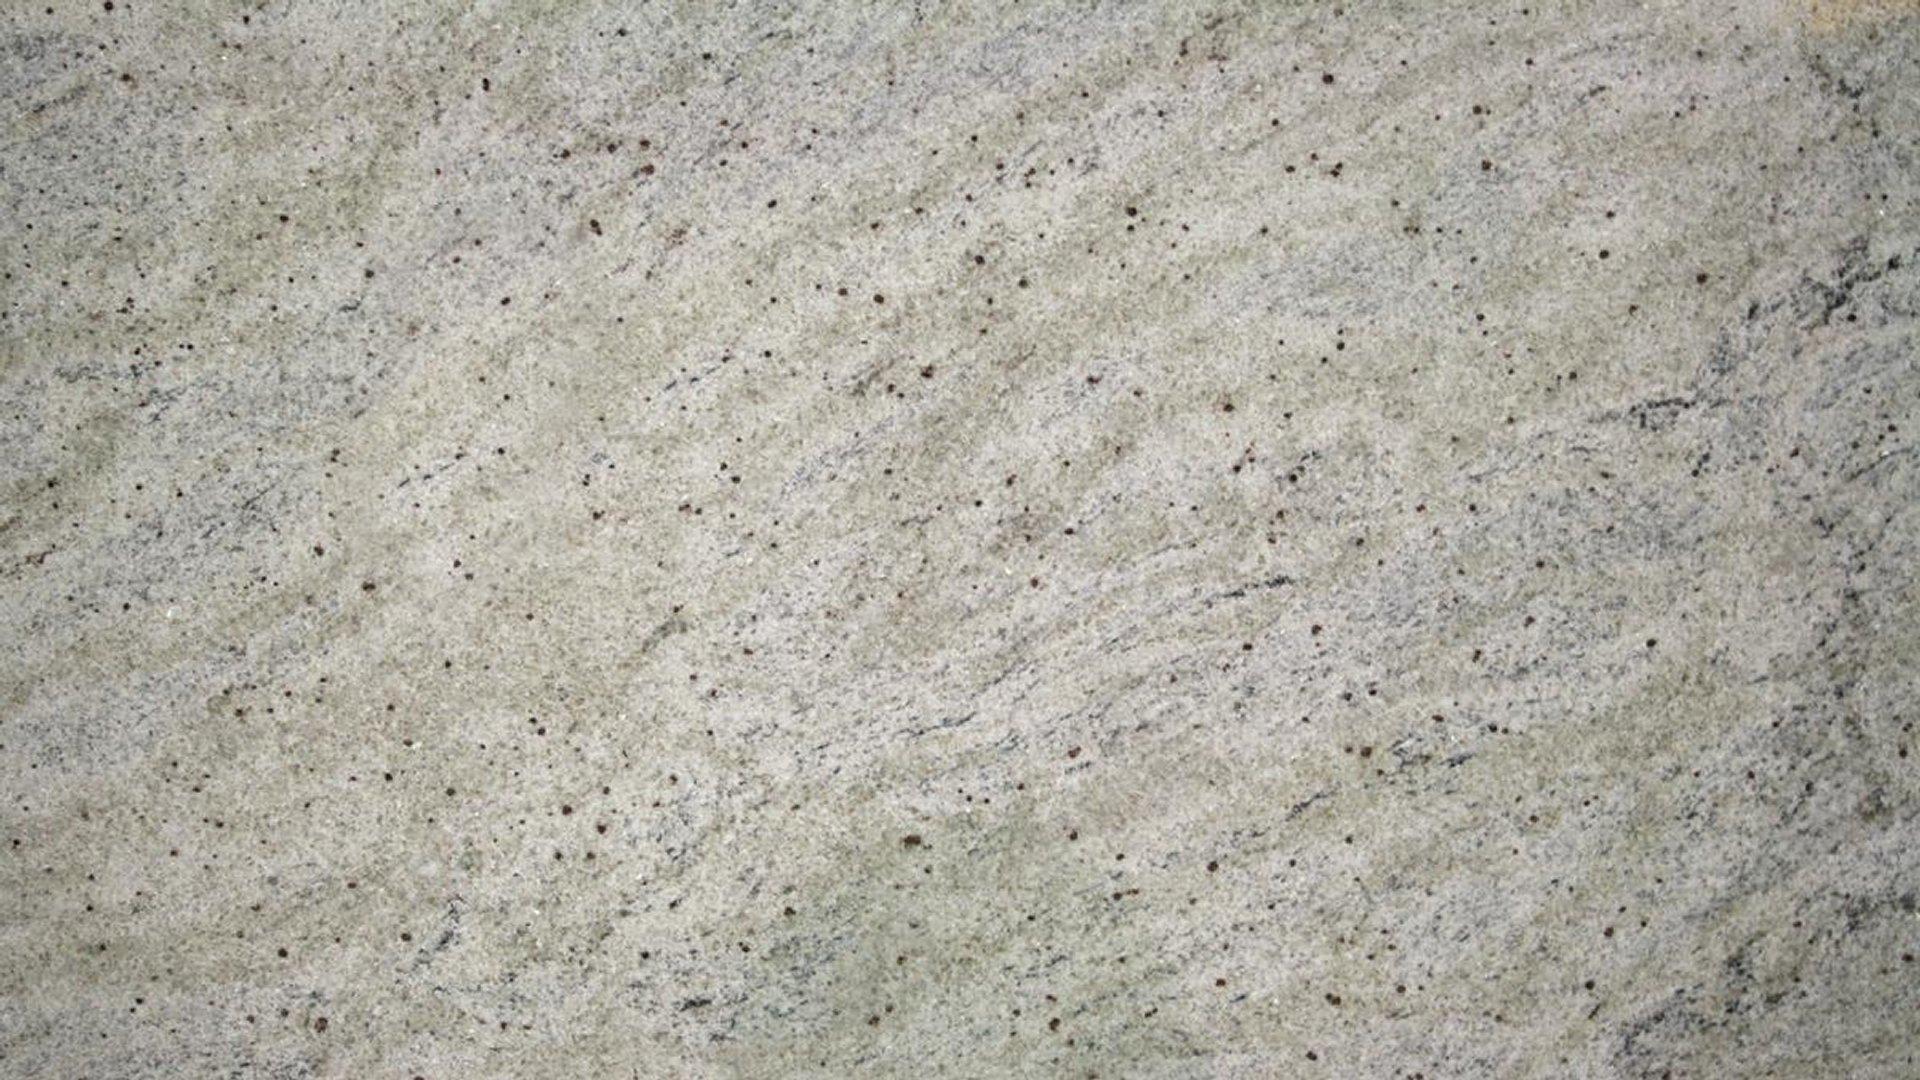 granit kashmir white kamnose tvo drago petrovi s p. Black Bedroom Furniture Sets. Home Design Ideas